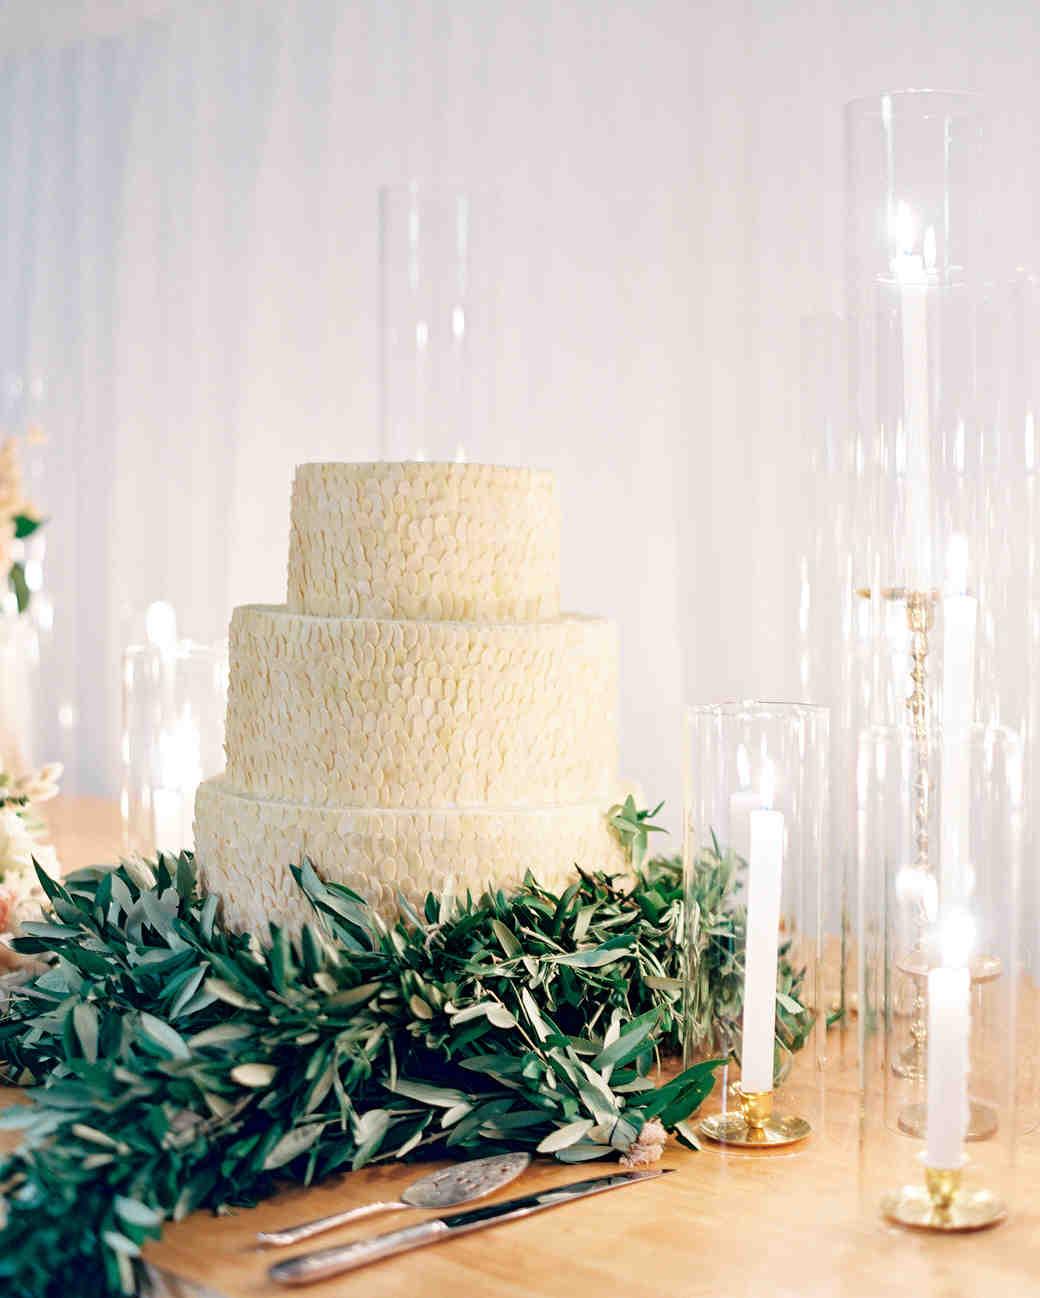 jemma-michael-wedding-cake-002643004-s112110-0815.jpg